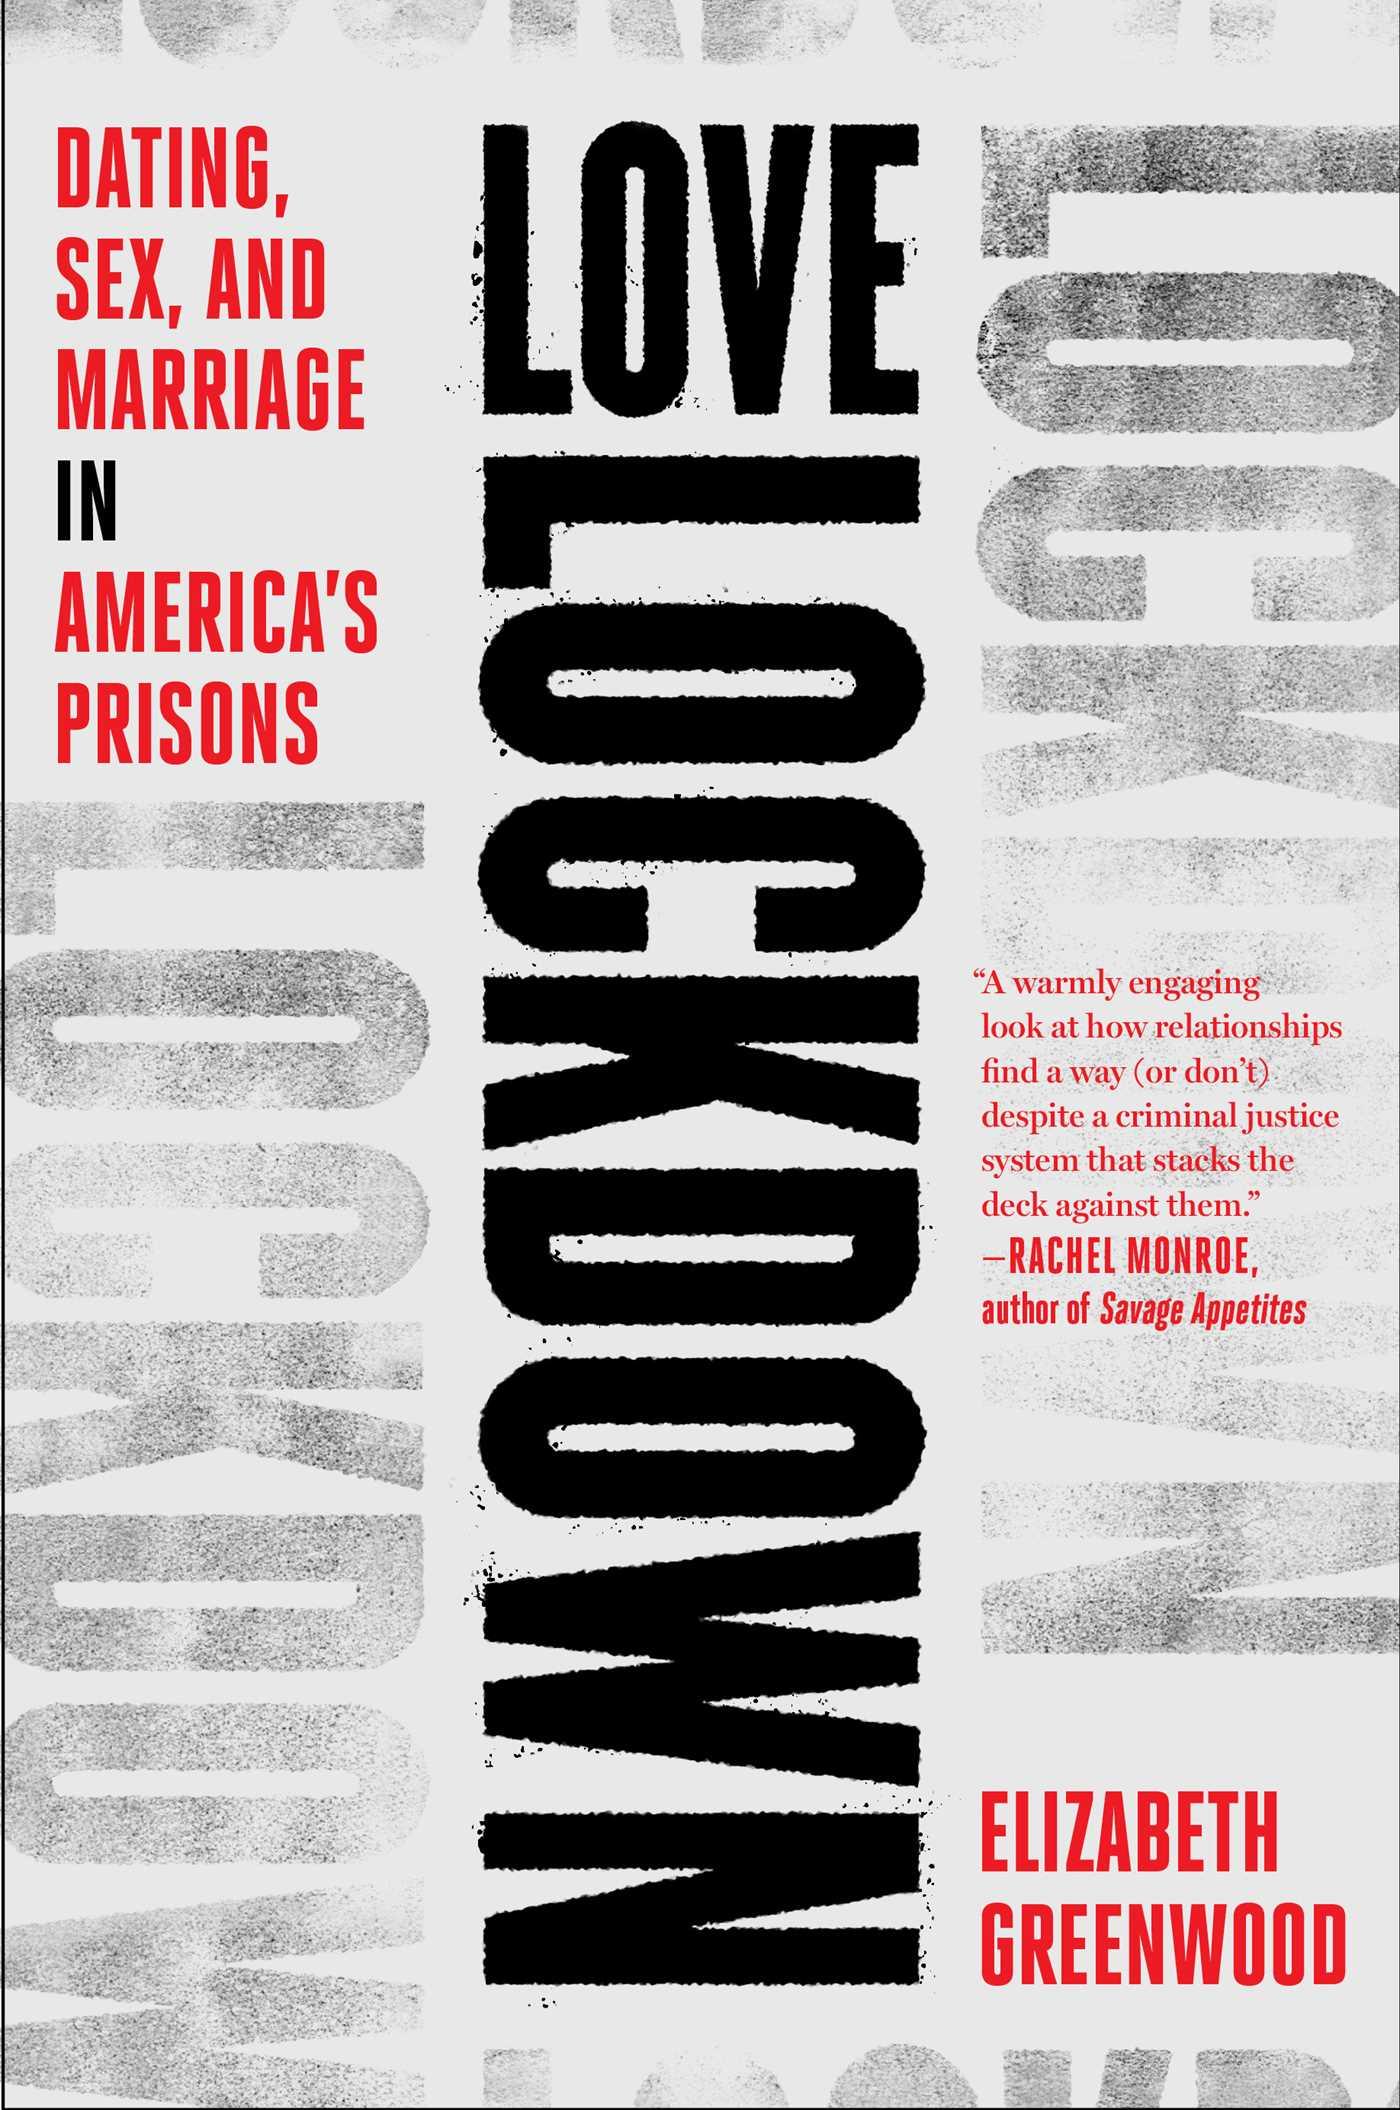 Virtual Book Launch: Love Lockdown by Elizabeth Greenwood in conversation with Benjamin Lorr